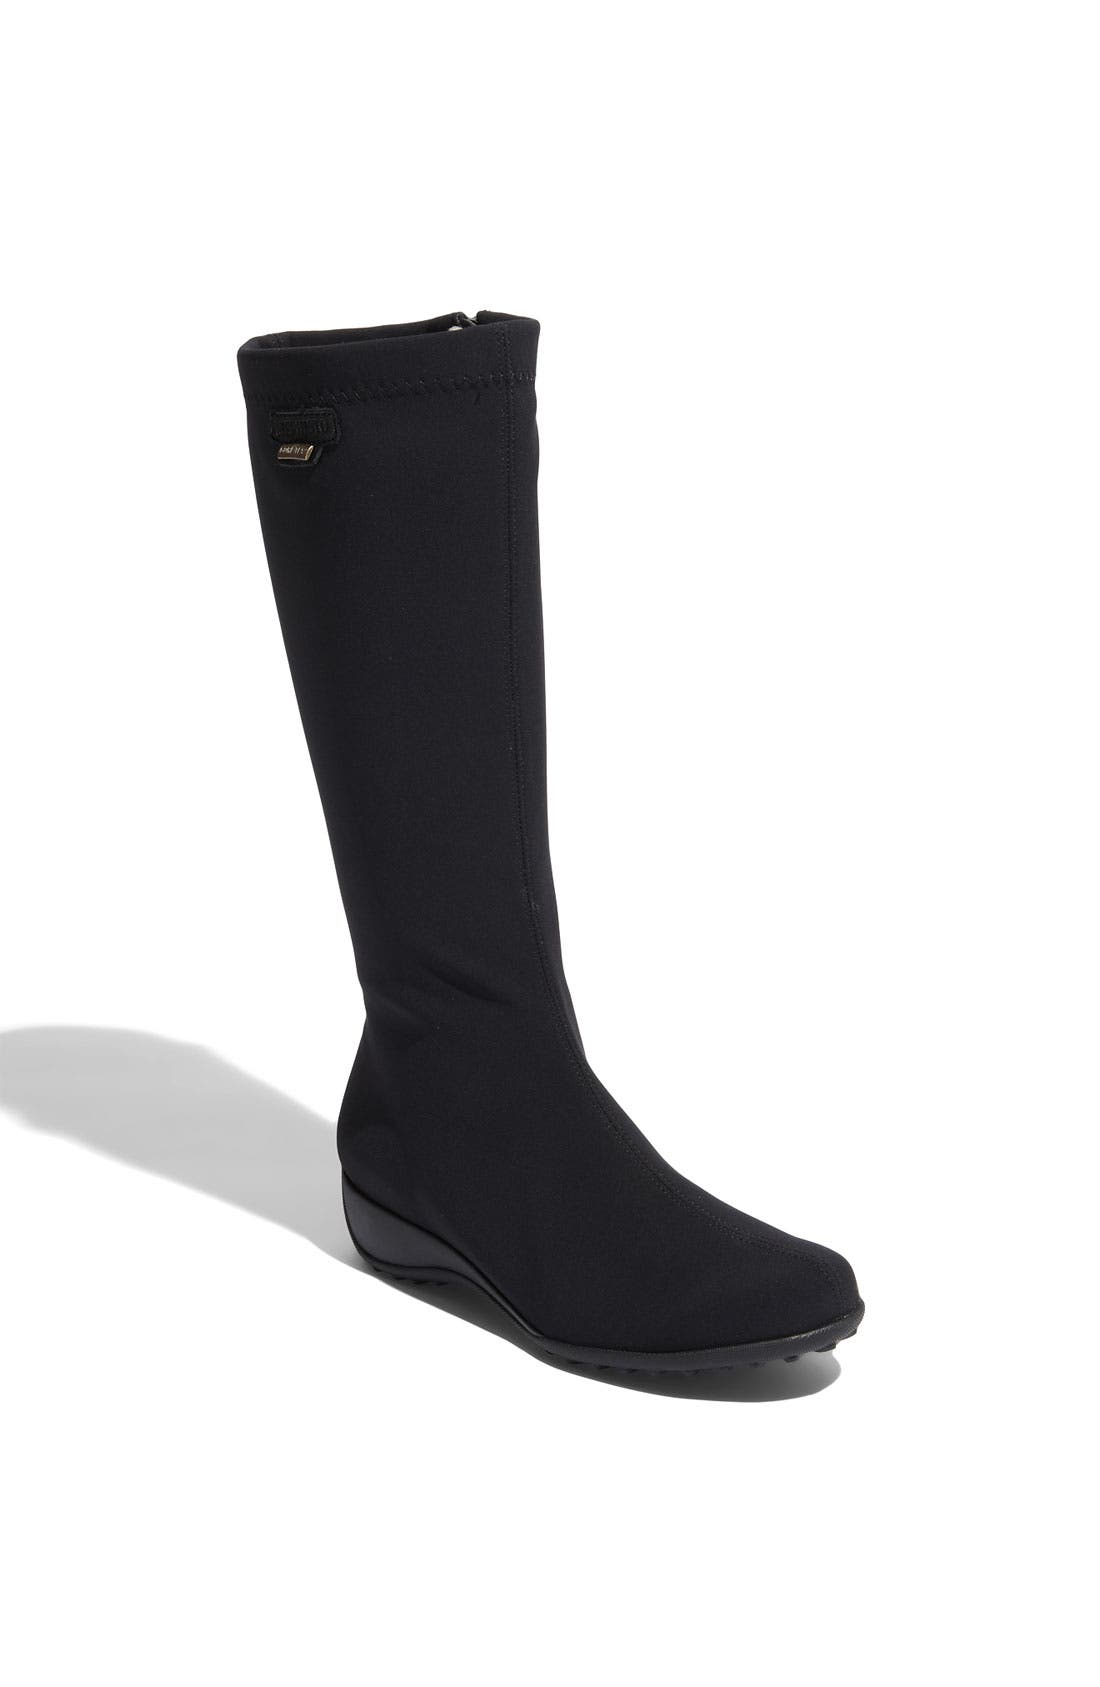 Alternate Image 1 Selected - Mephisto 'Linda' Waterproof Stretch Boot